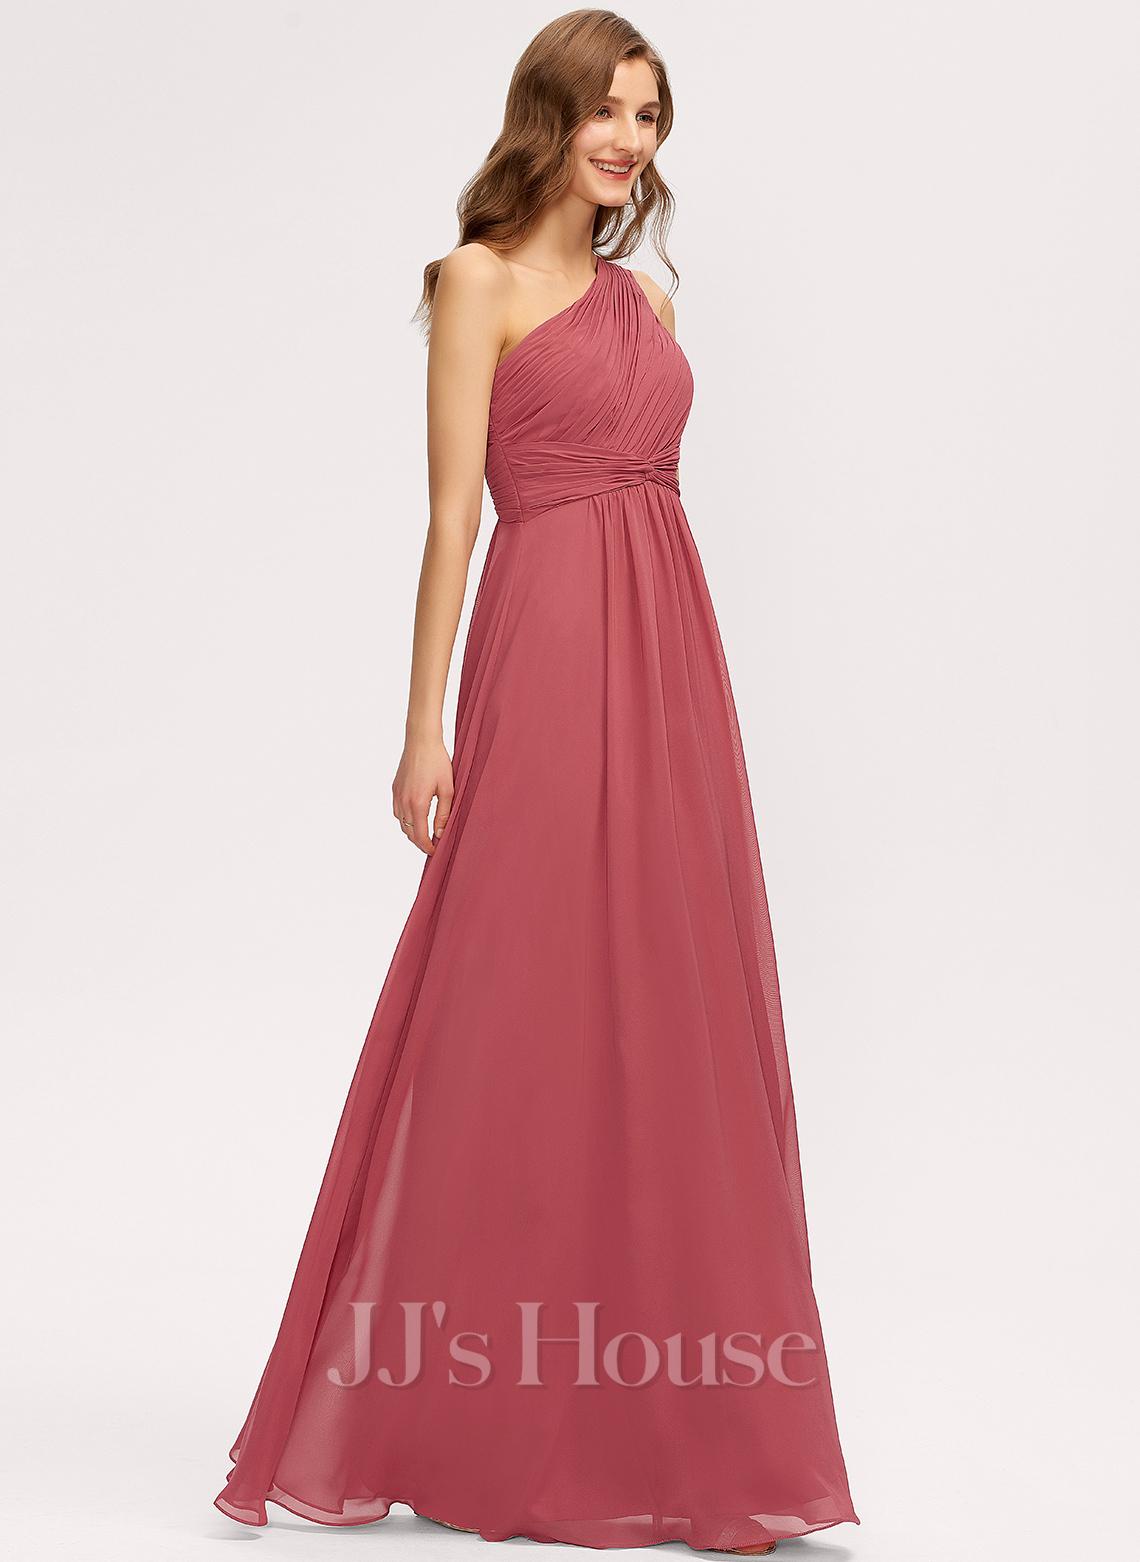 One-Shoulder Floor-Length Chiffon Bridesmaid Dress With Ruffle